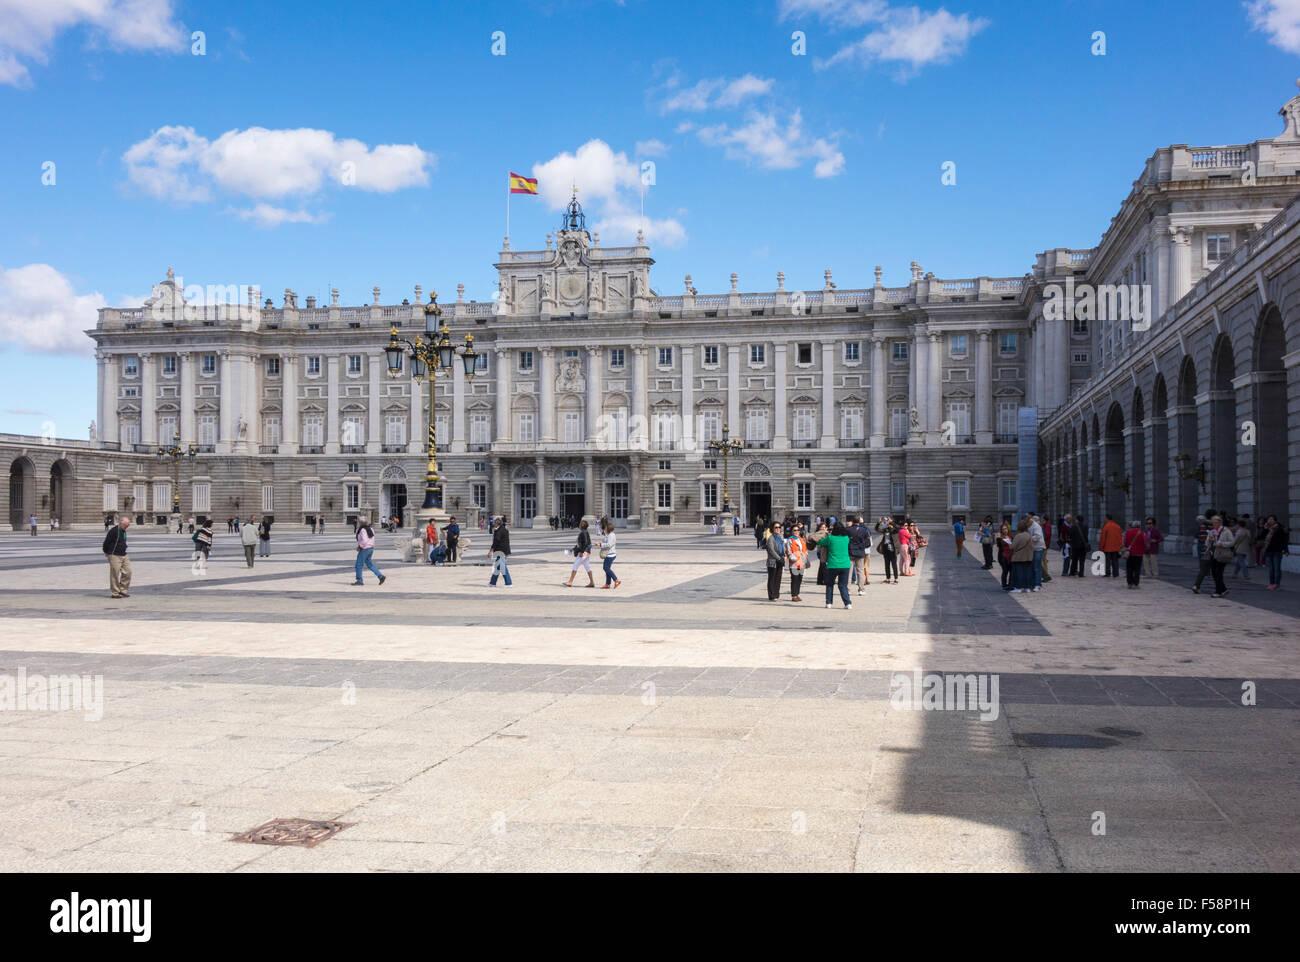 Main entrance to Royal Palace of Palacio Real in Madrid city center, Spain, Europe - Stock Image